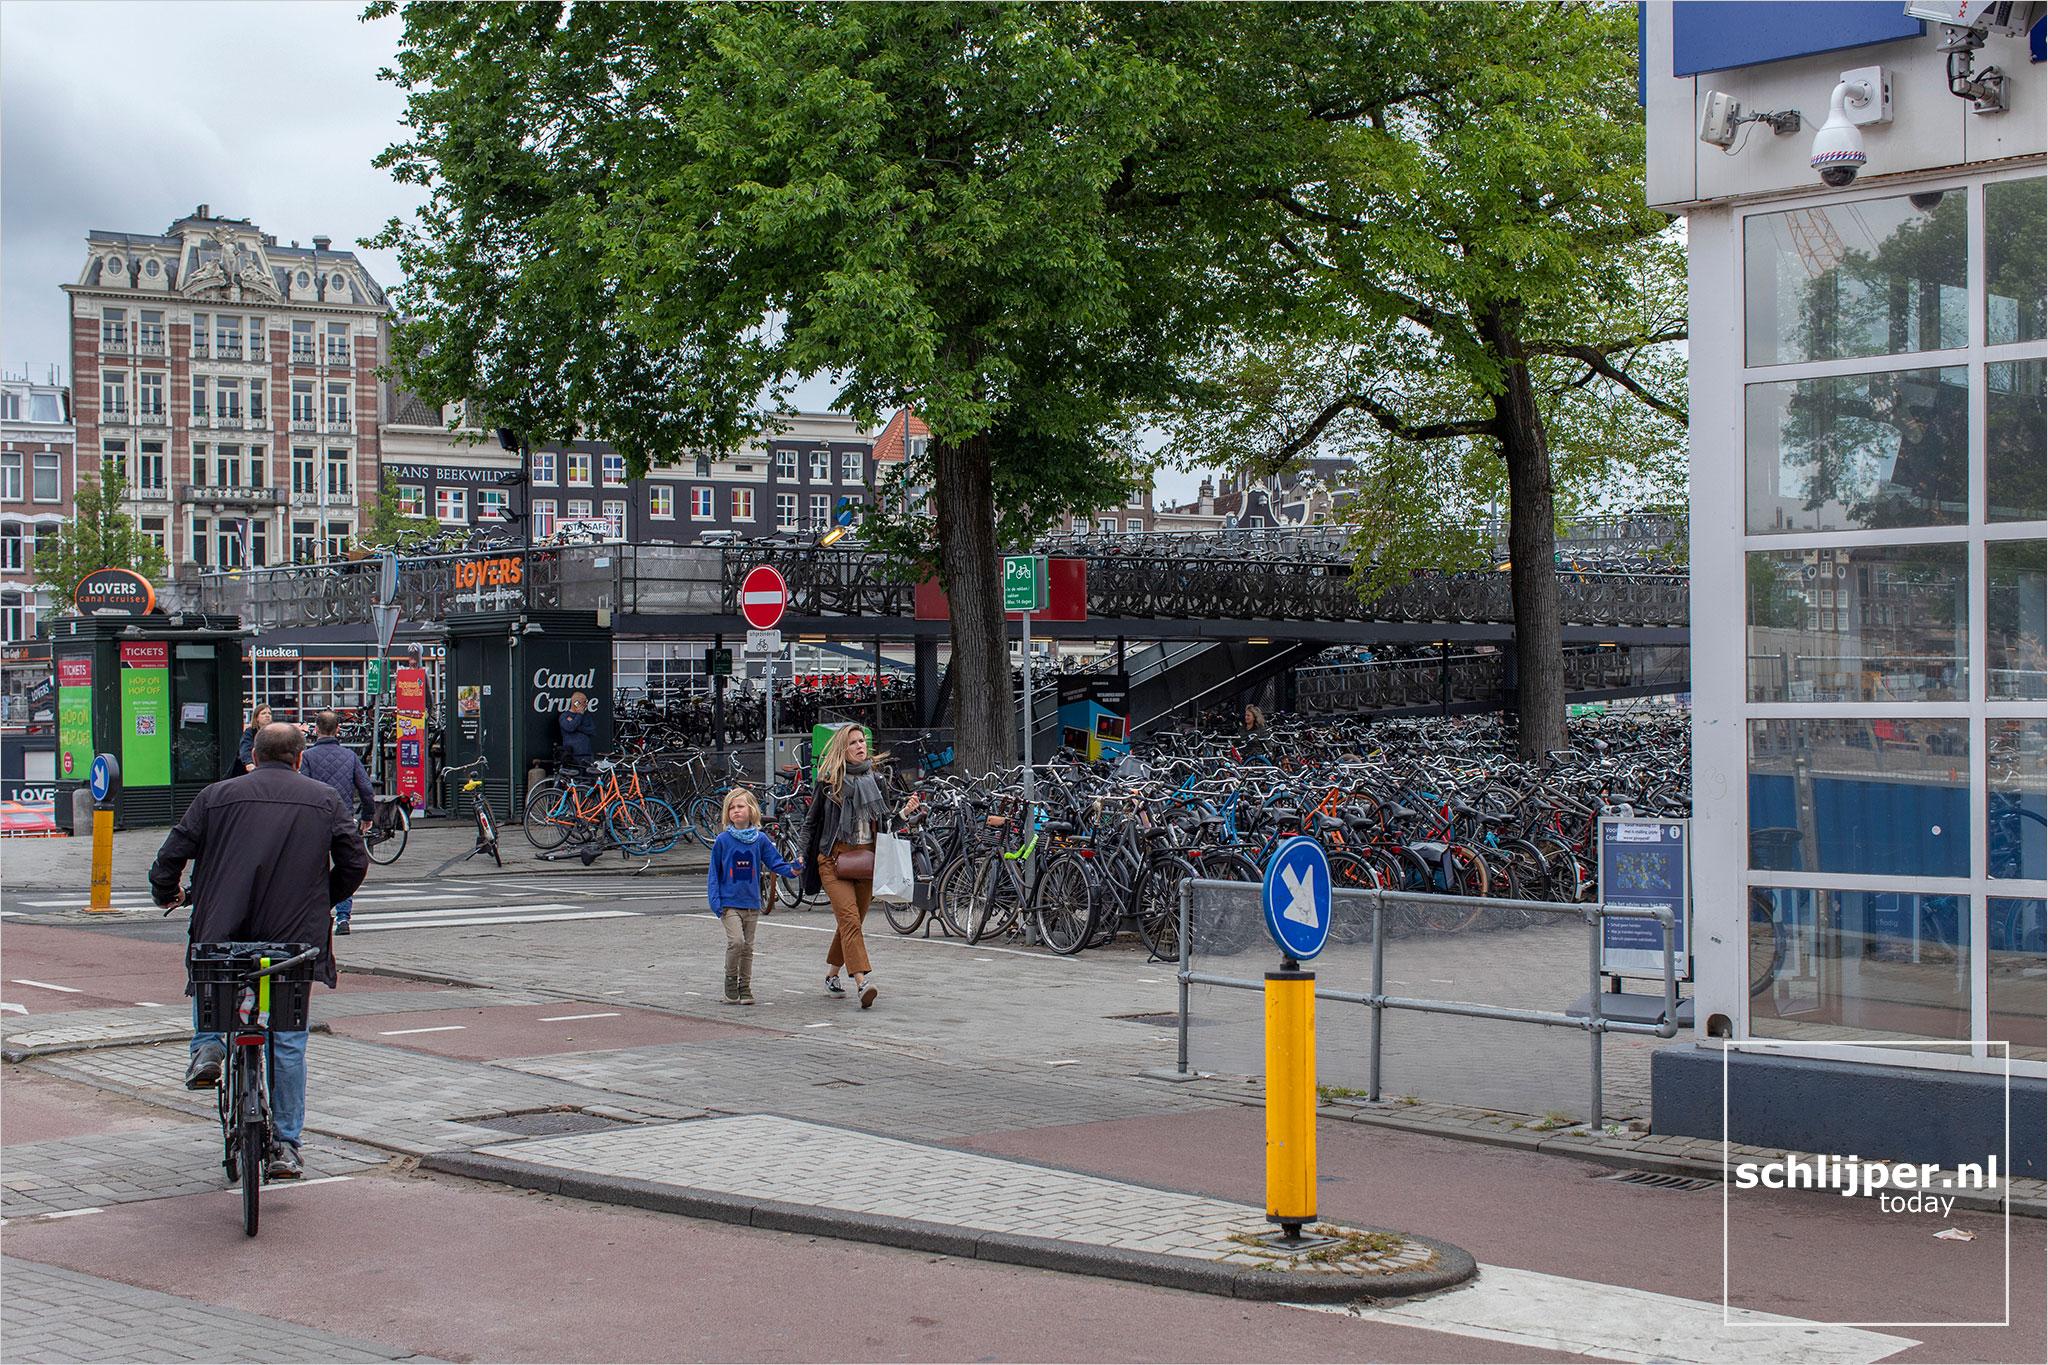 Nederland, Amsterdam, 24 mei 2020